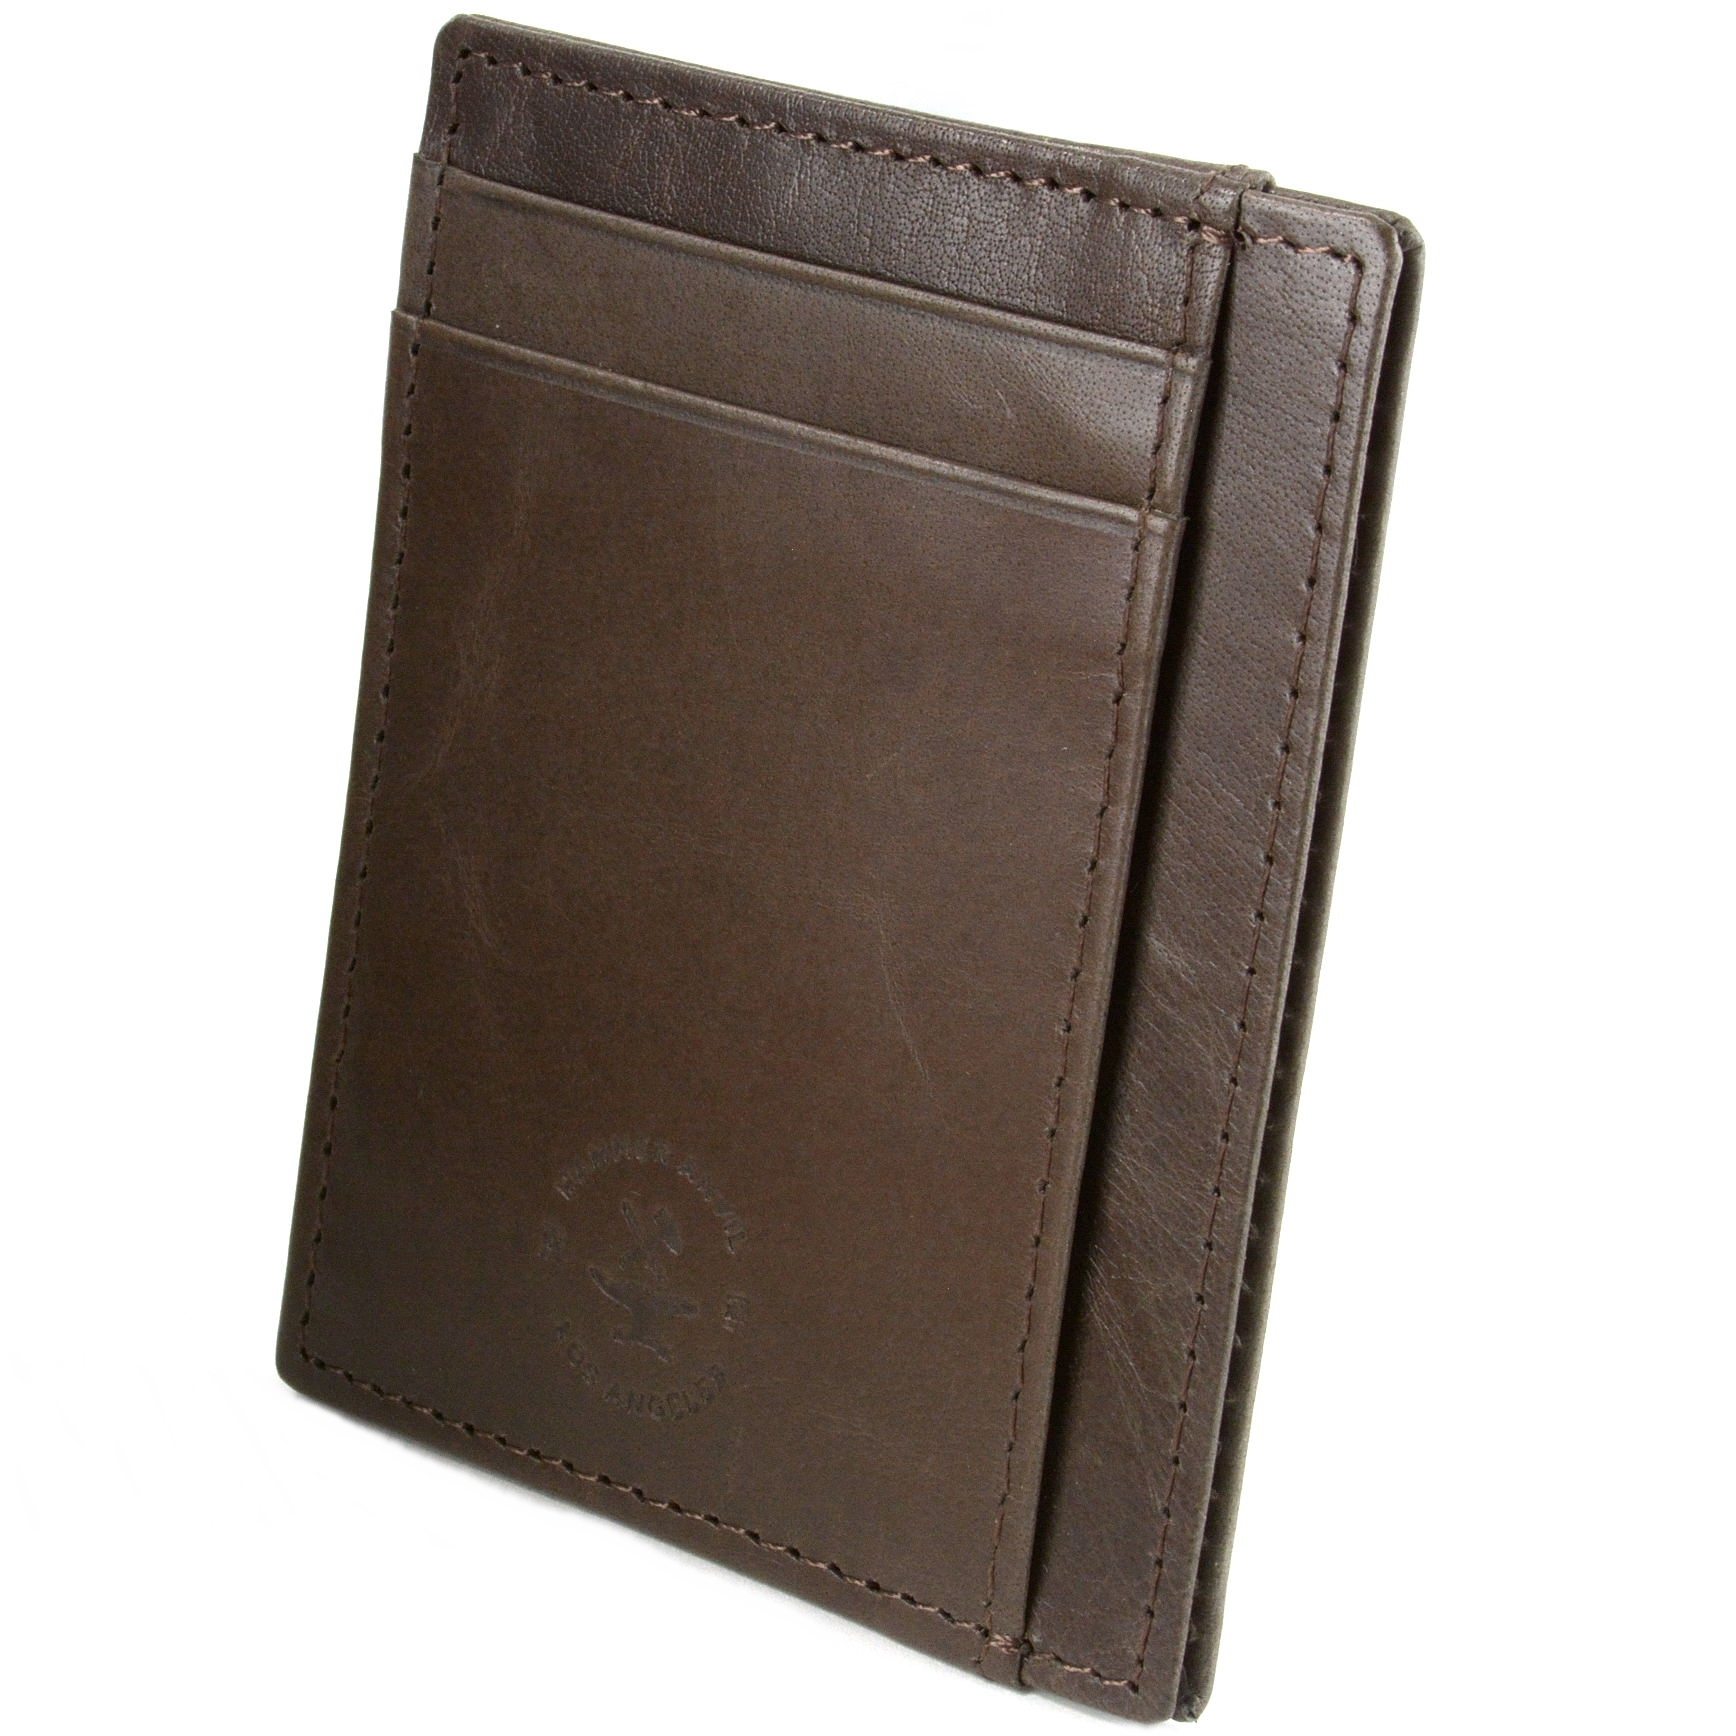 miniature 28 - Hammer-Anvil-Minimalist-Front-Pocket-Wallet-RFID-Blocking-Thin-Leather-Card-Case